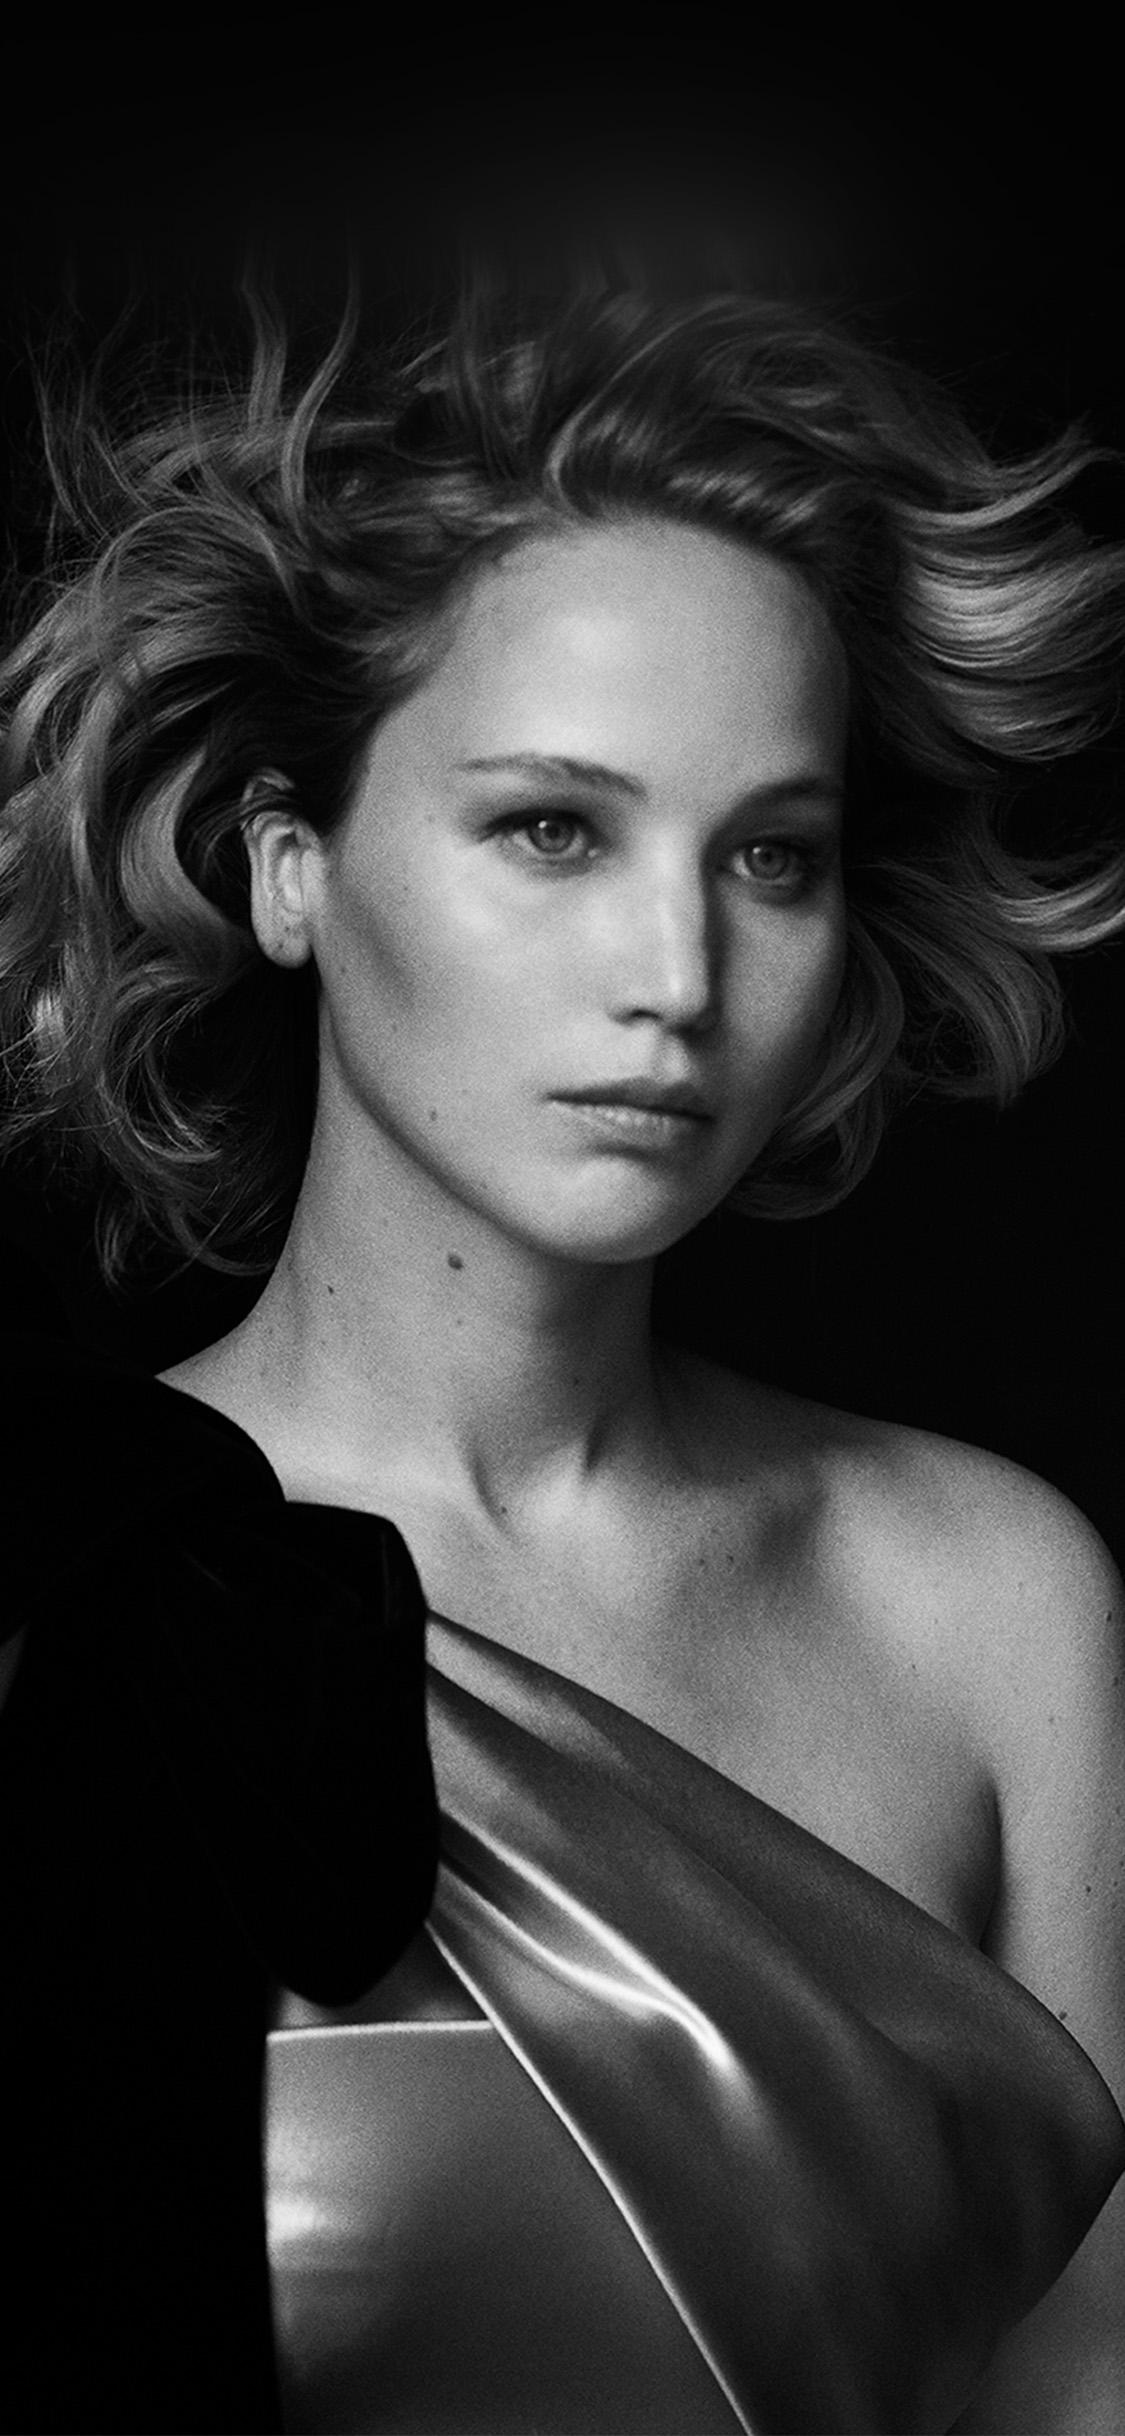 iPhonexpapers.com-Apple-iPhone-wallpaper-hp82-girl-bw-celebrity-film-actress